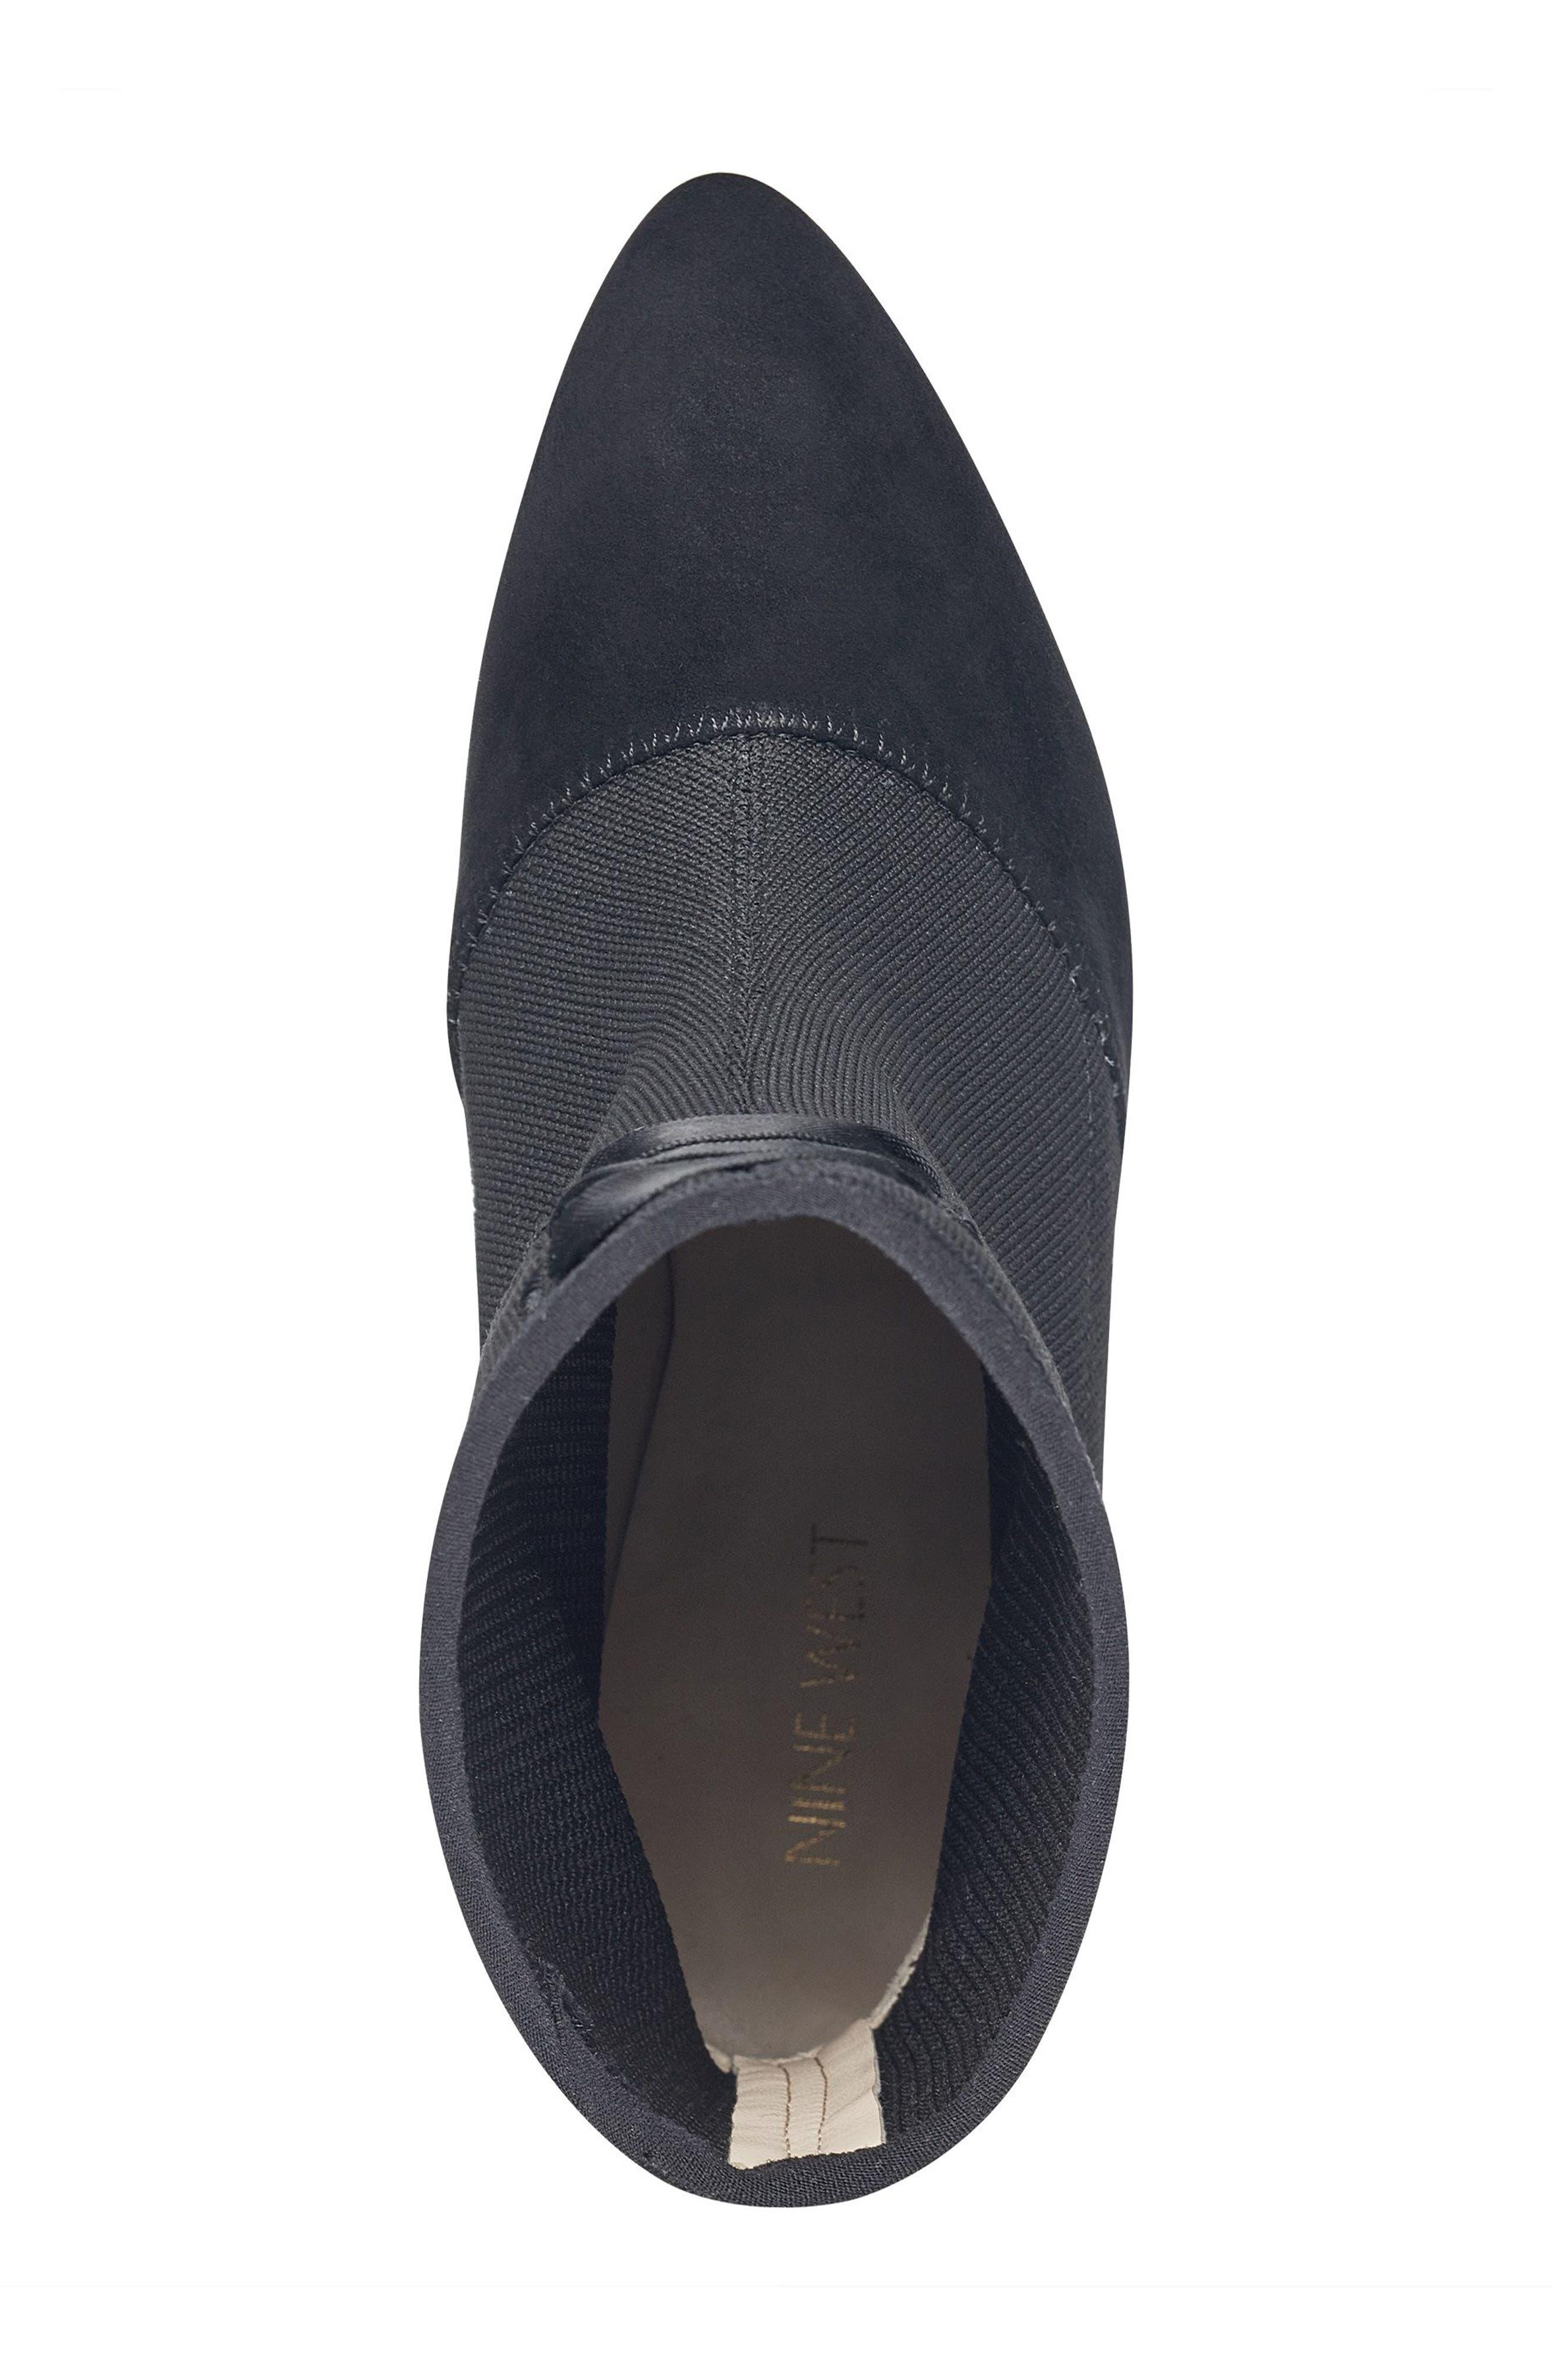 Carolina Pointy Toe Bootie,                             Alternate thumbnail 5, color,                             Black Multi Fabric